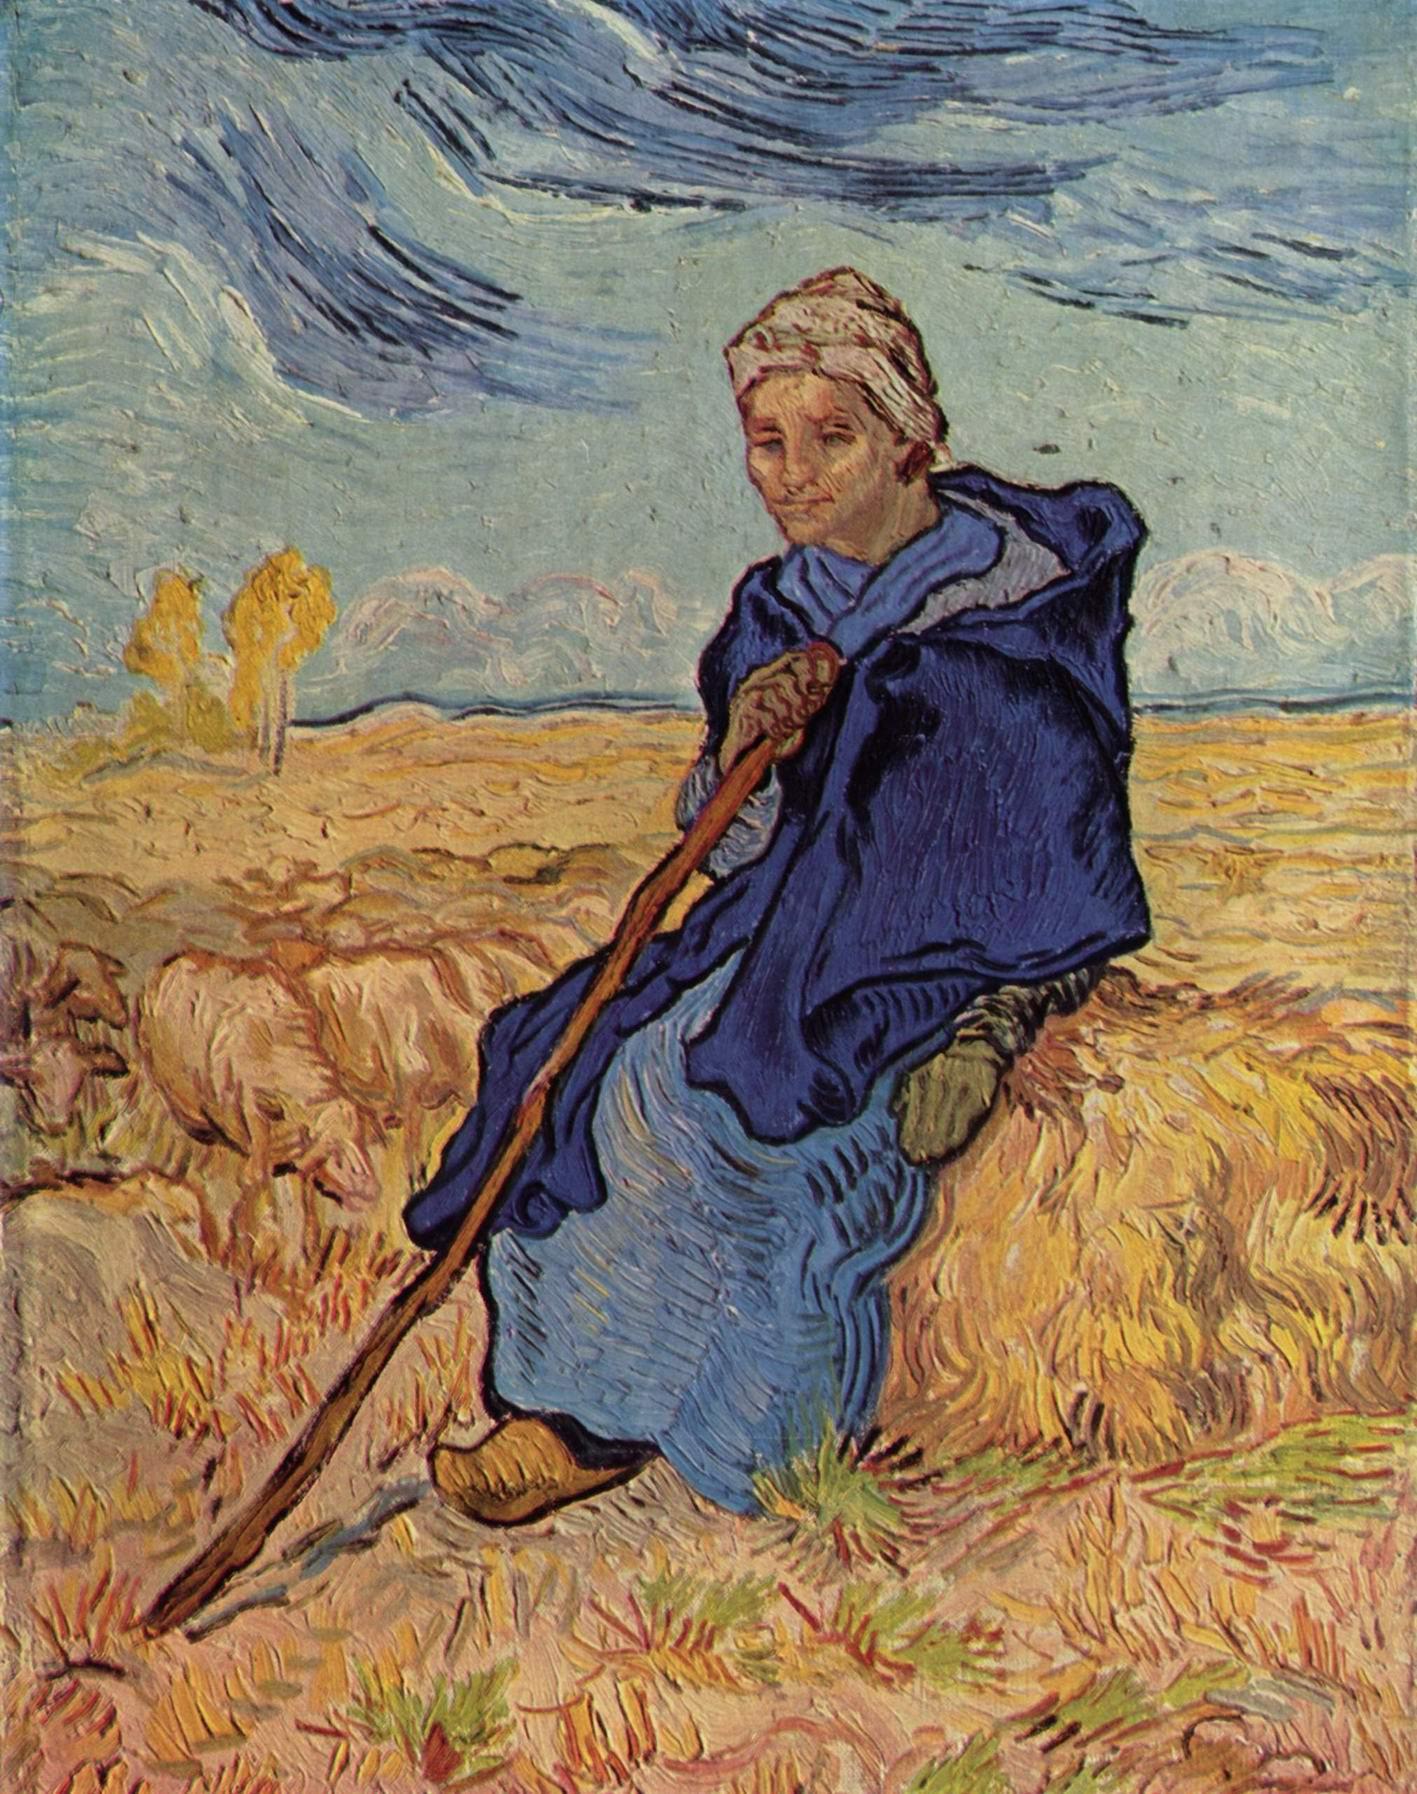 Пастушка, Ван Гог Винсент Виллем